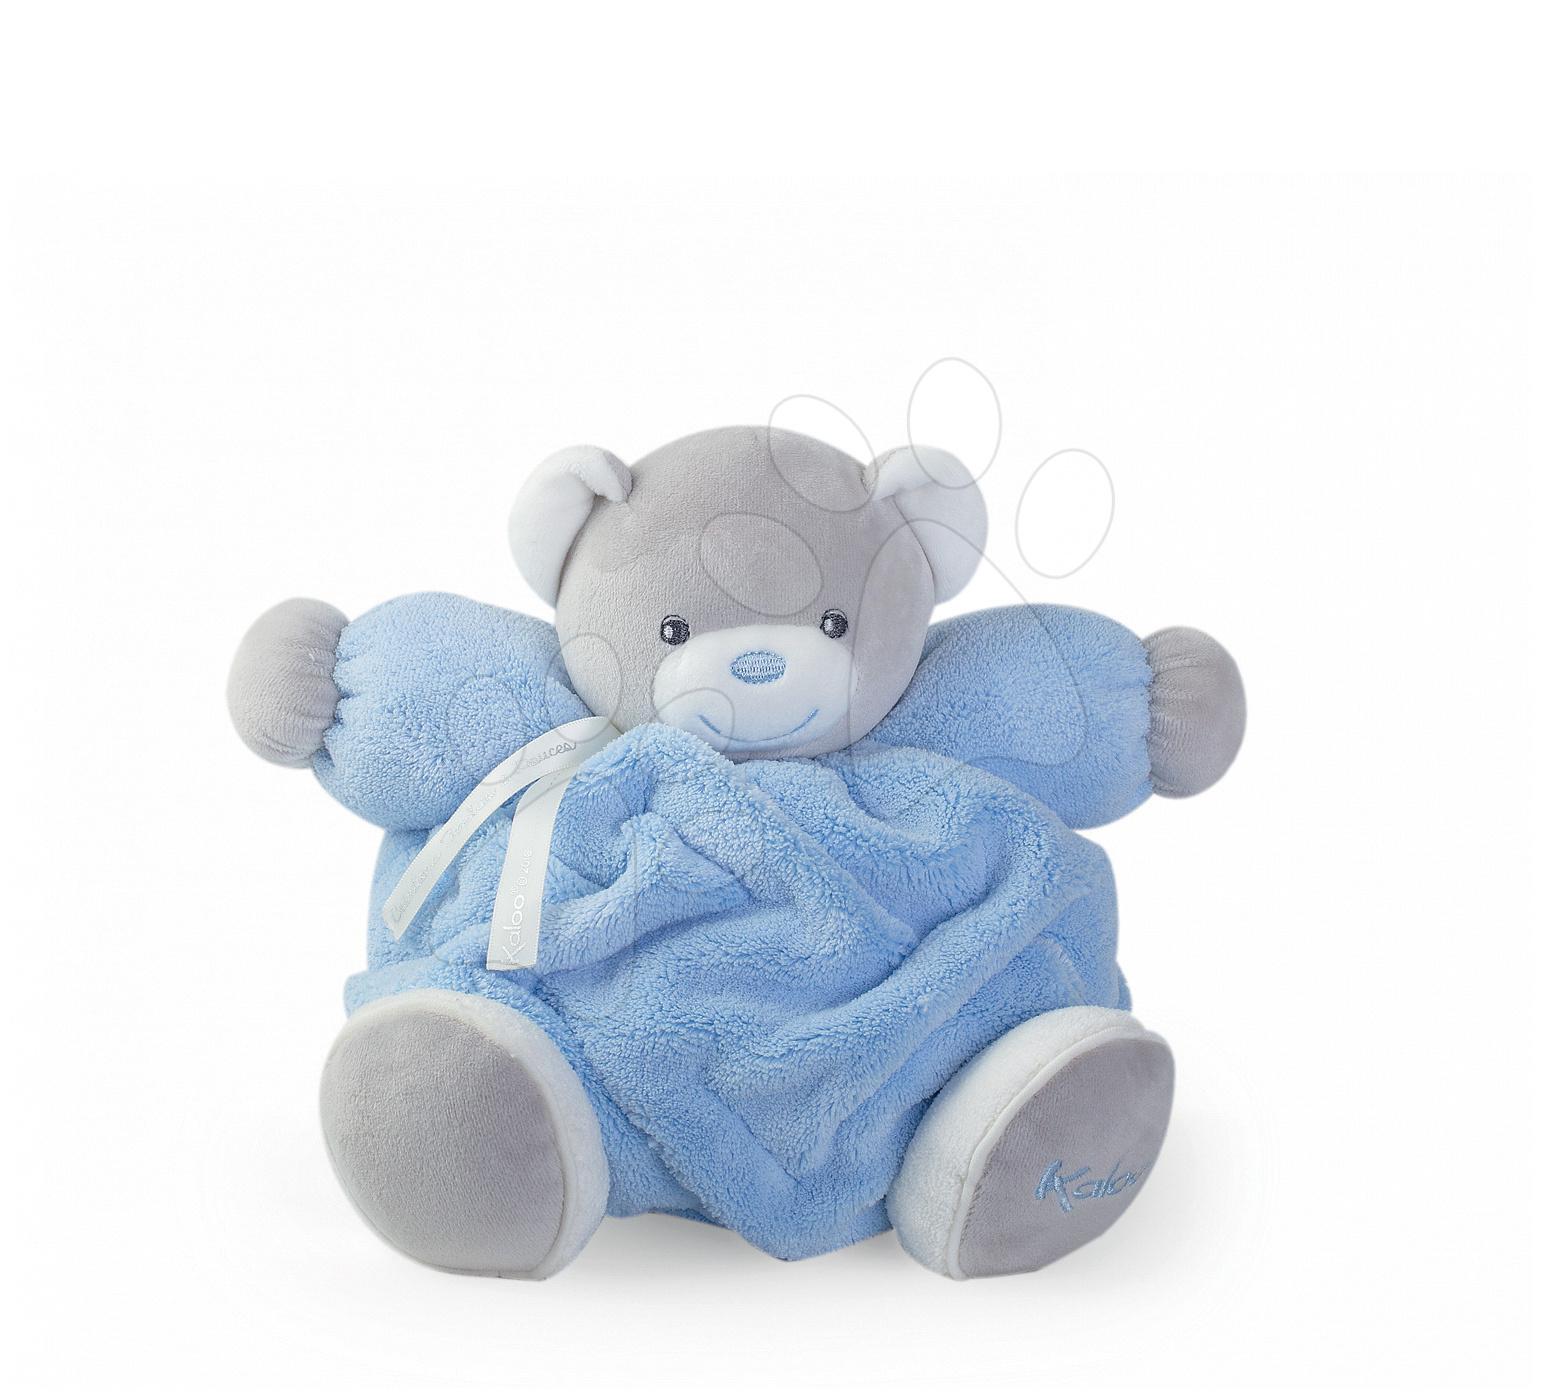 Kaloo plyšový macko Plume Chubby 25 cm 969554 modrý